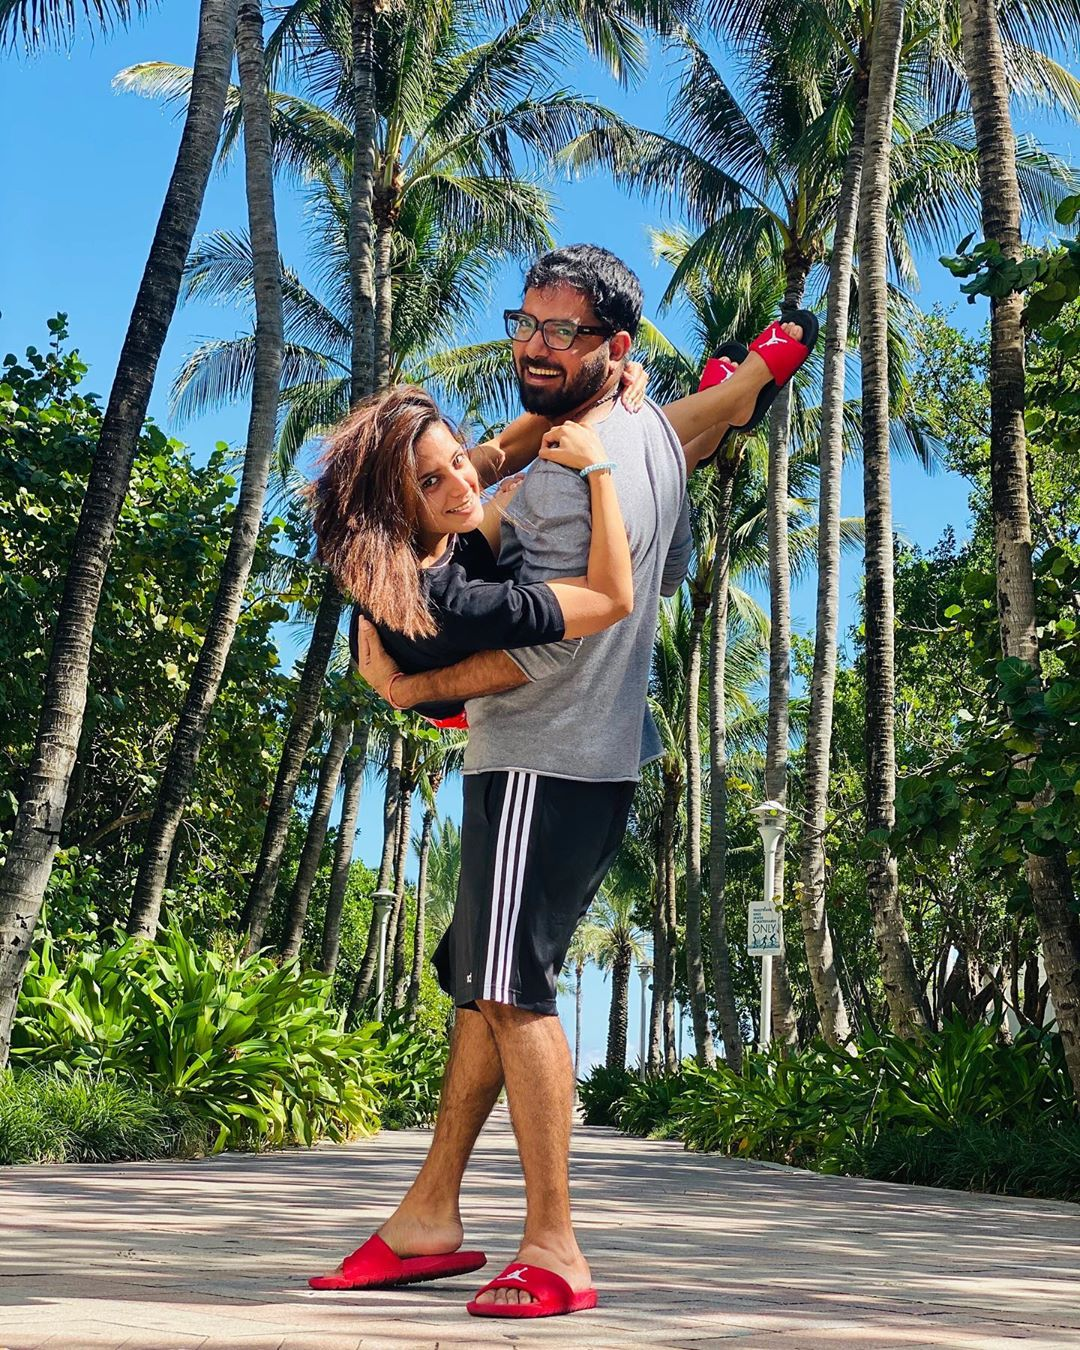 Latest Clicks of Iqra Aziz and Yasir Hussain in Miami USA